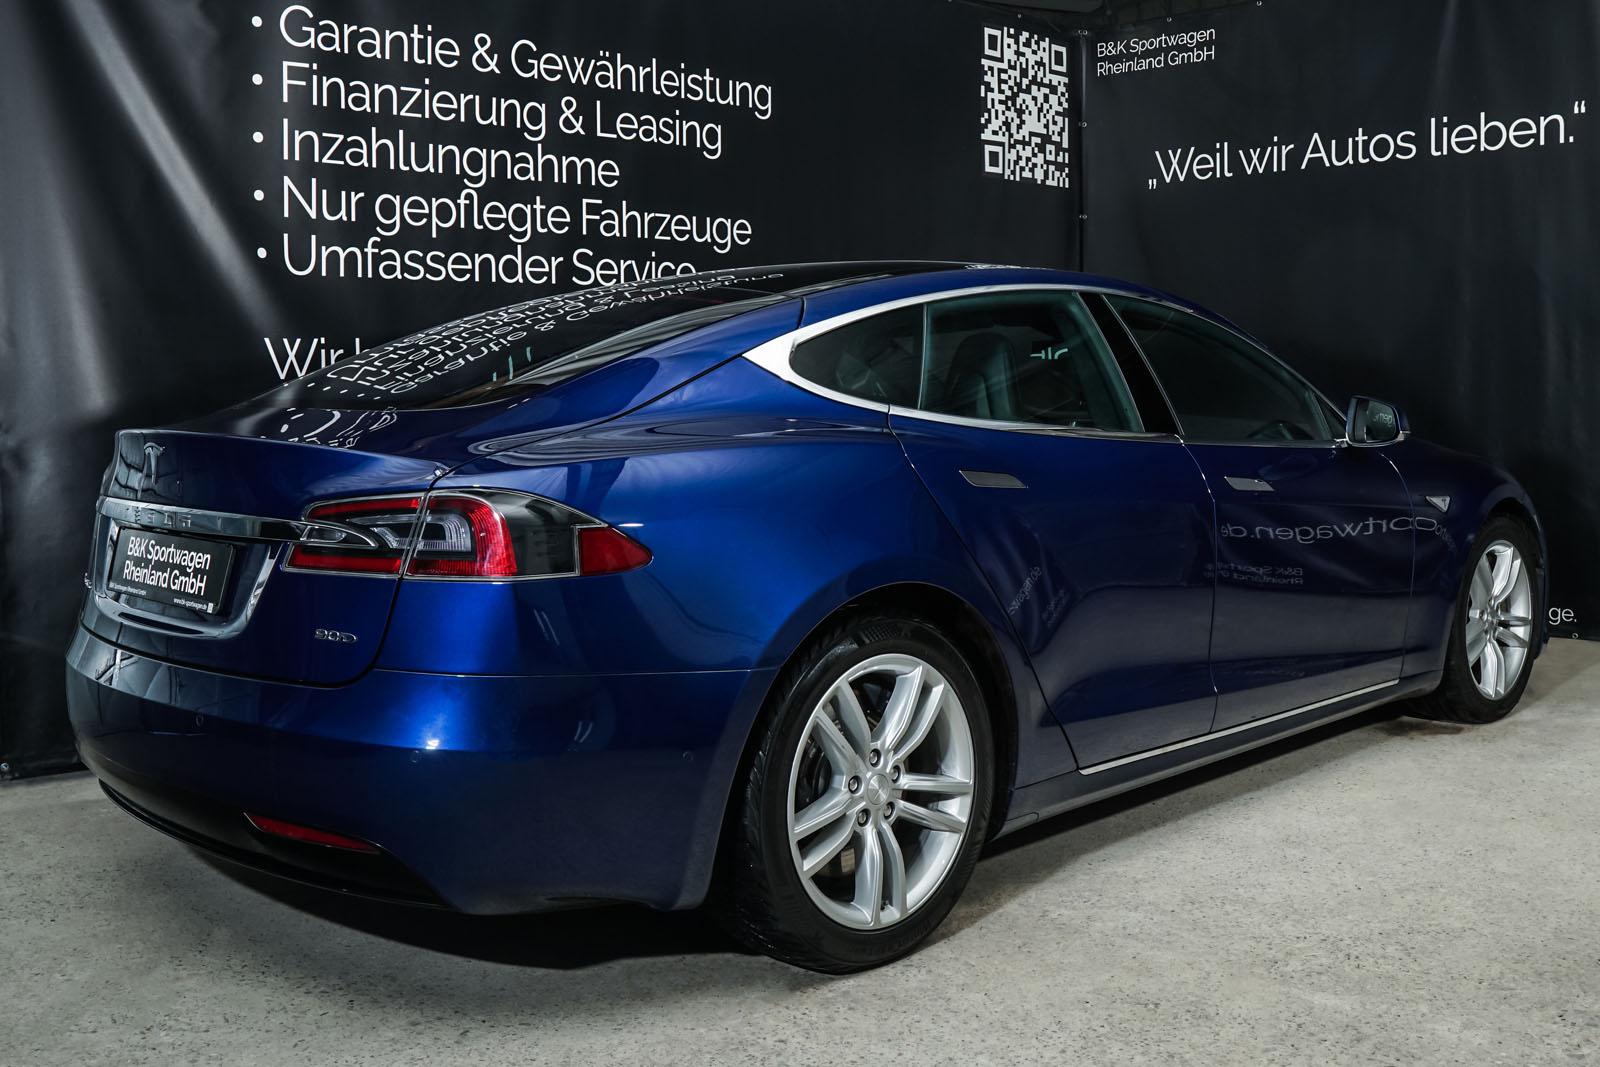 Tesla_ModelS_90D_Blau_Schwarz_Tes-0513_12_w